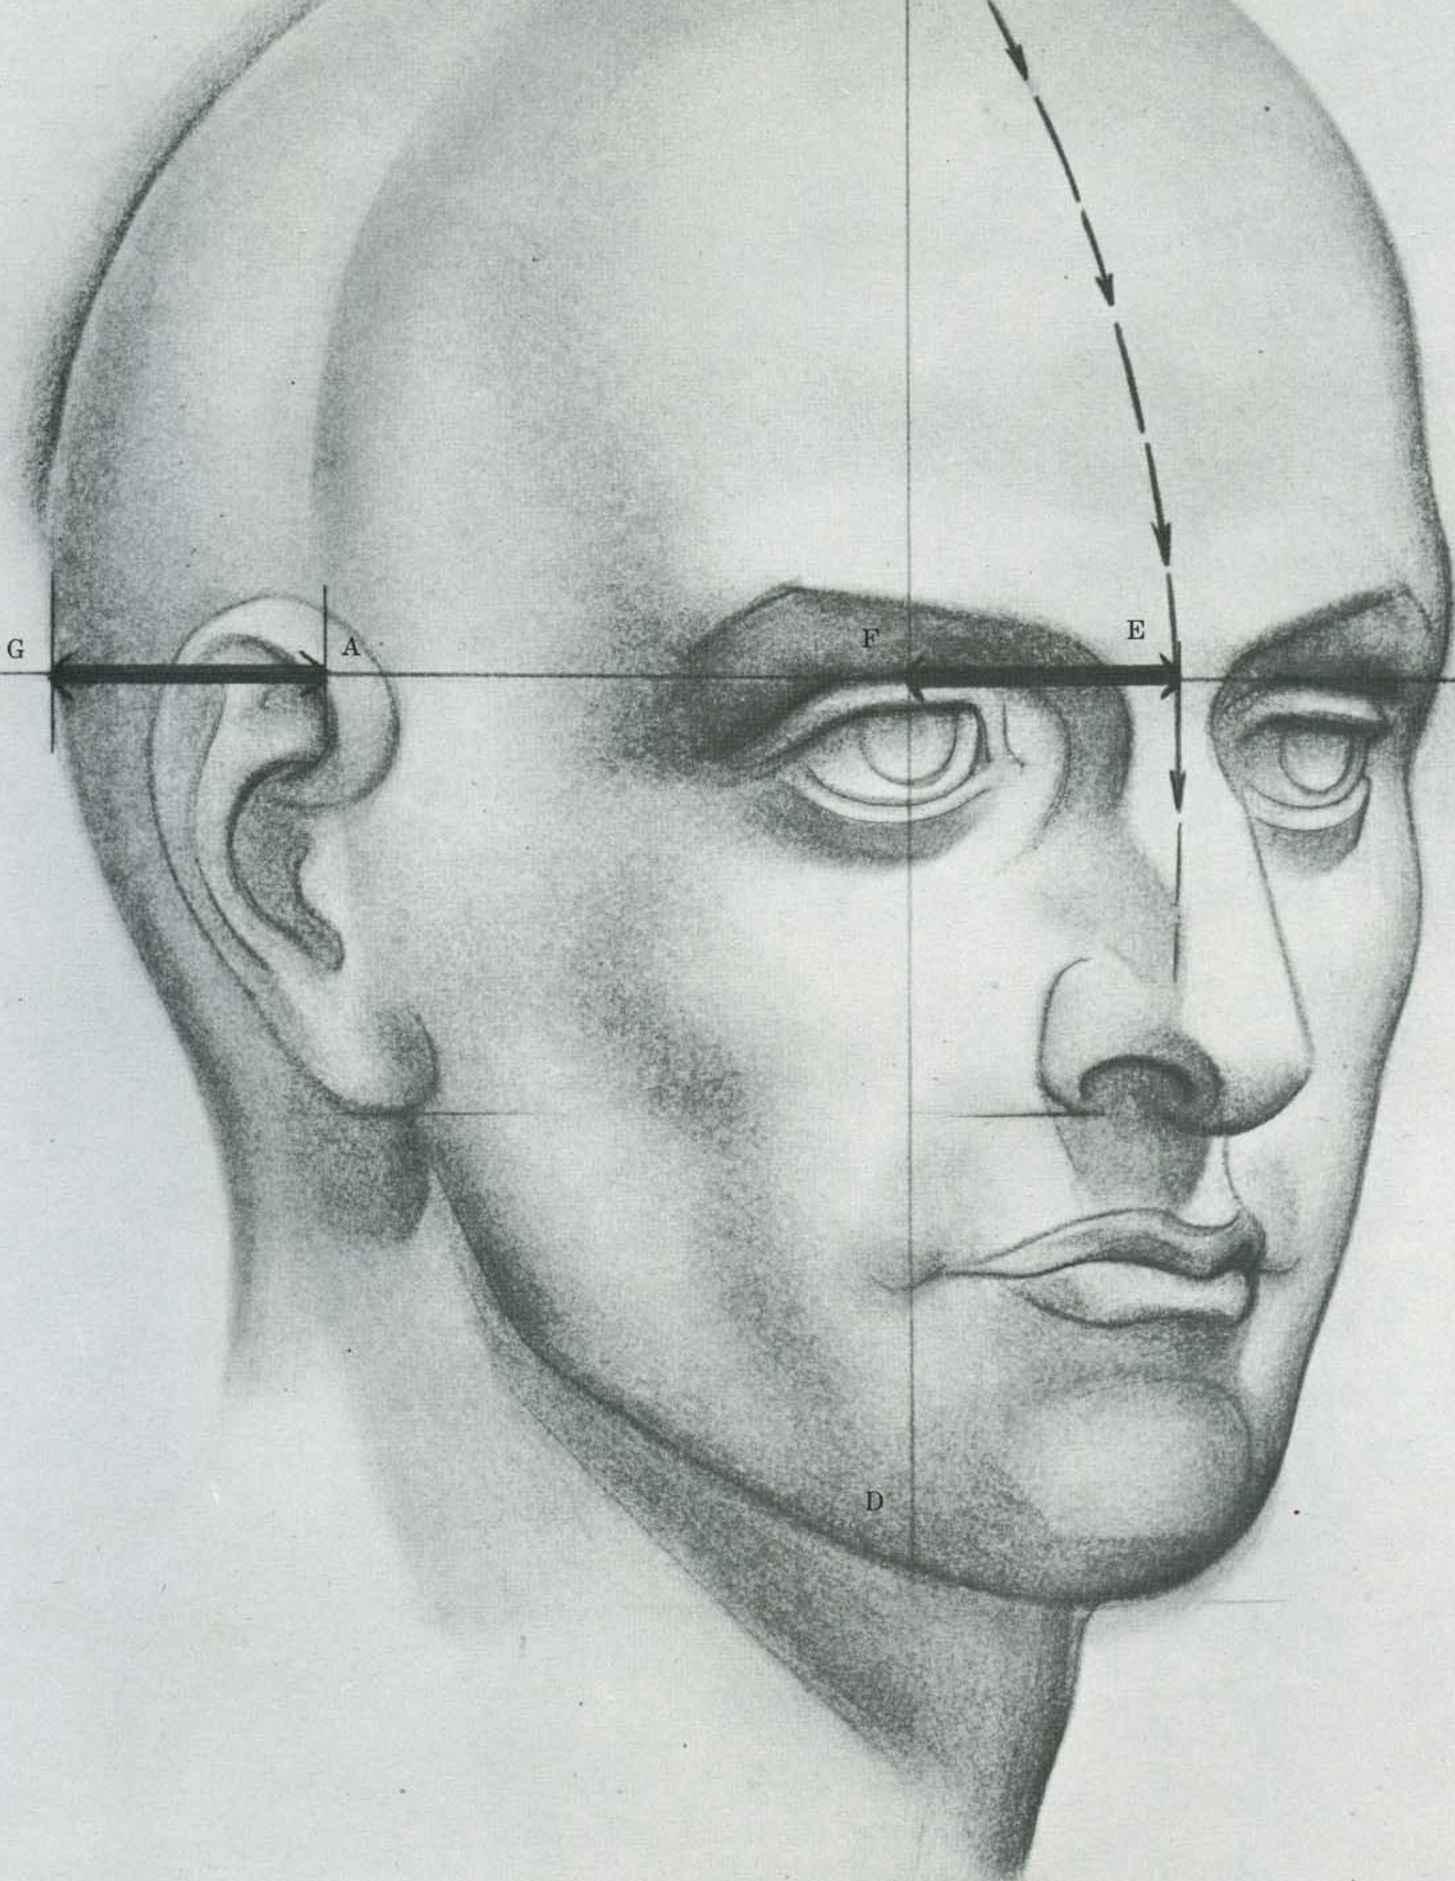 Drawing The Human Head - Drawing The Human Head - Joshua Nava Arts